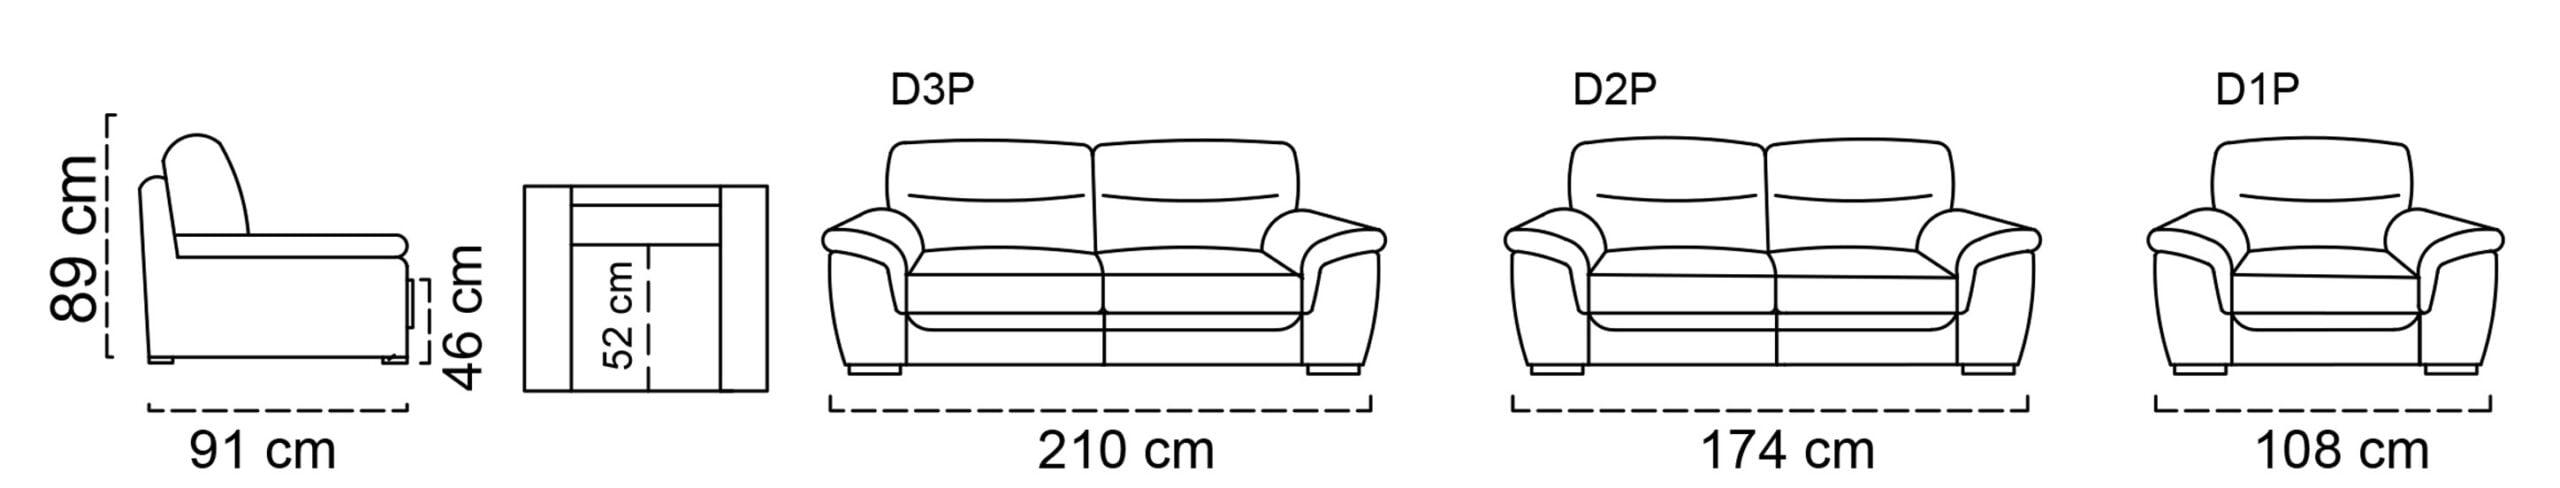 diana sofa giotto living sofa relax sofa ange sofa sofabed